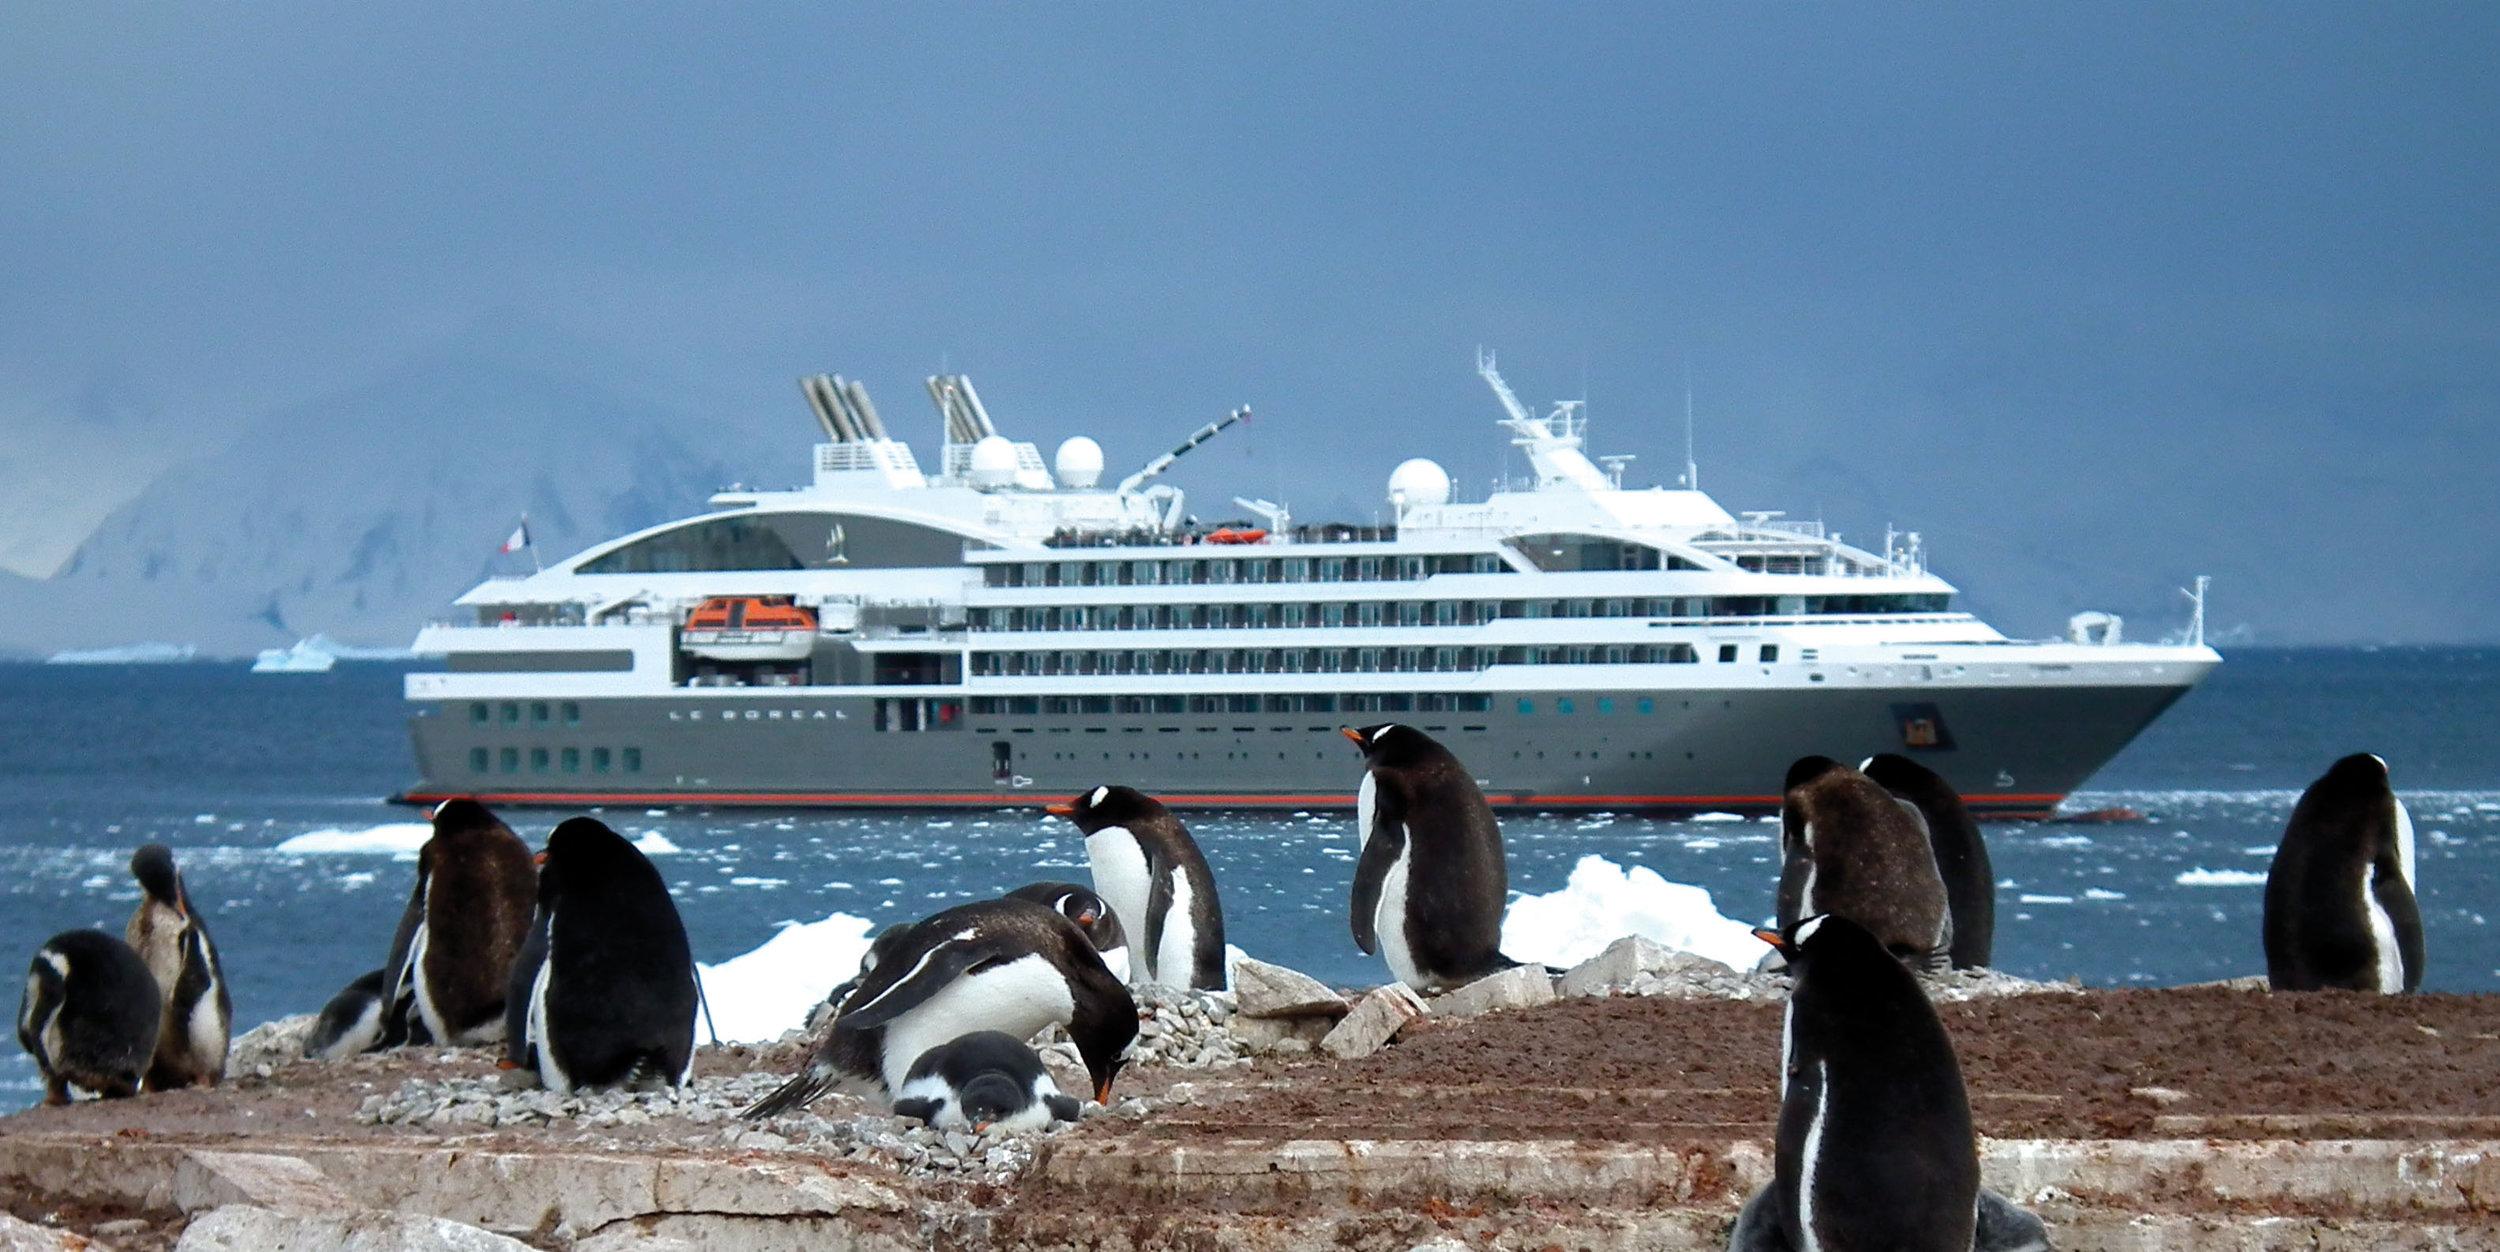 LeBoreal_penguins_004.jpg